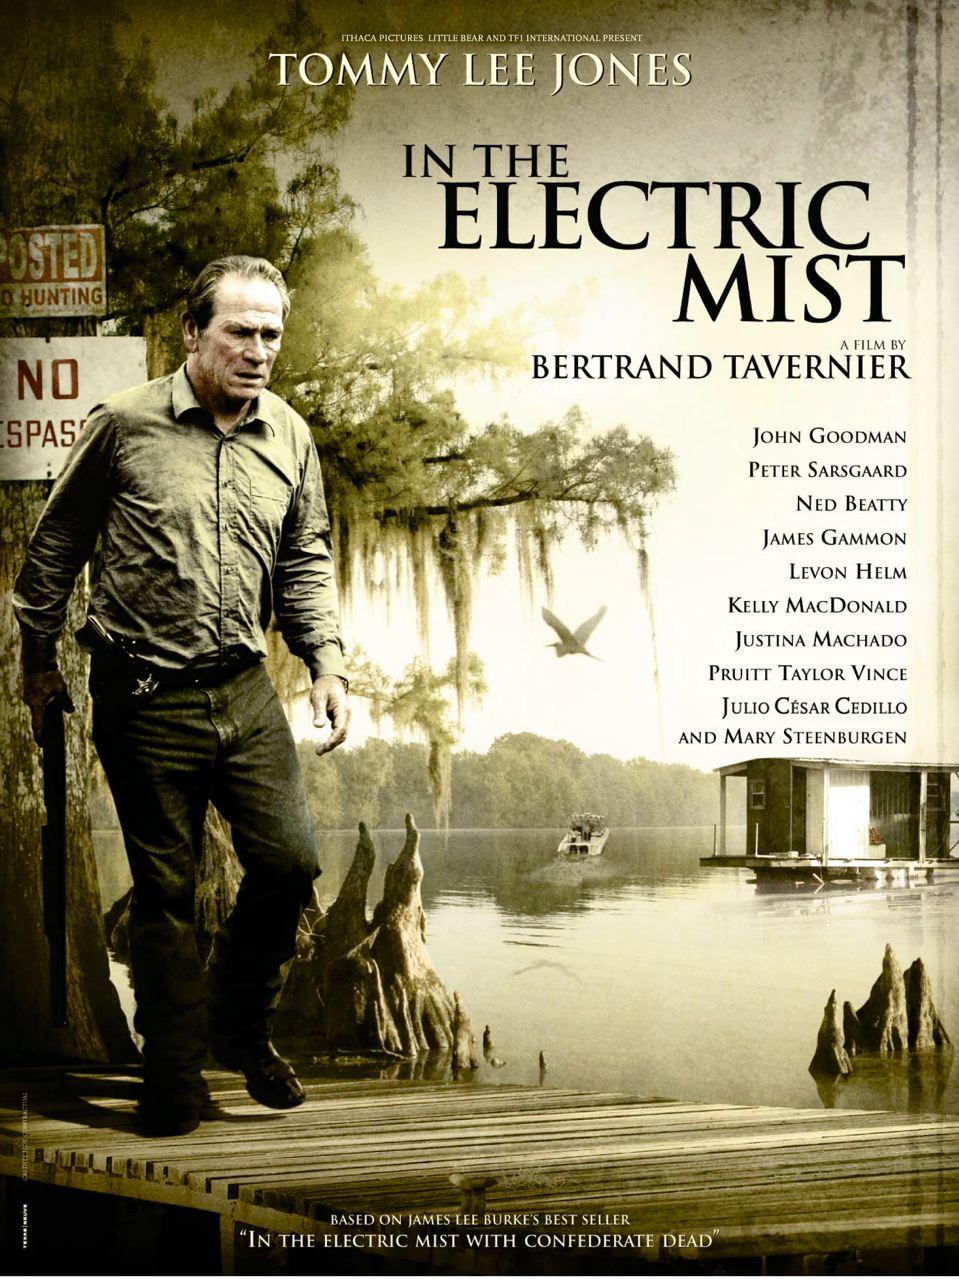 ELECTRIC MIST_POSTER.jpg